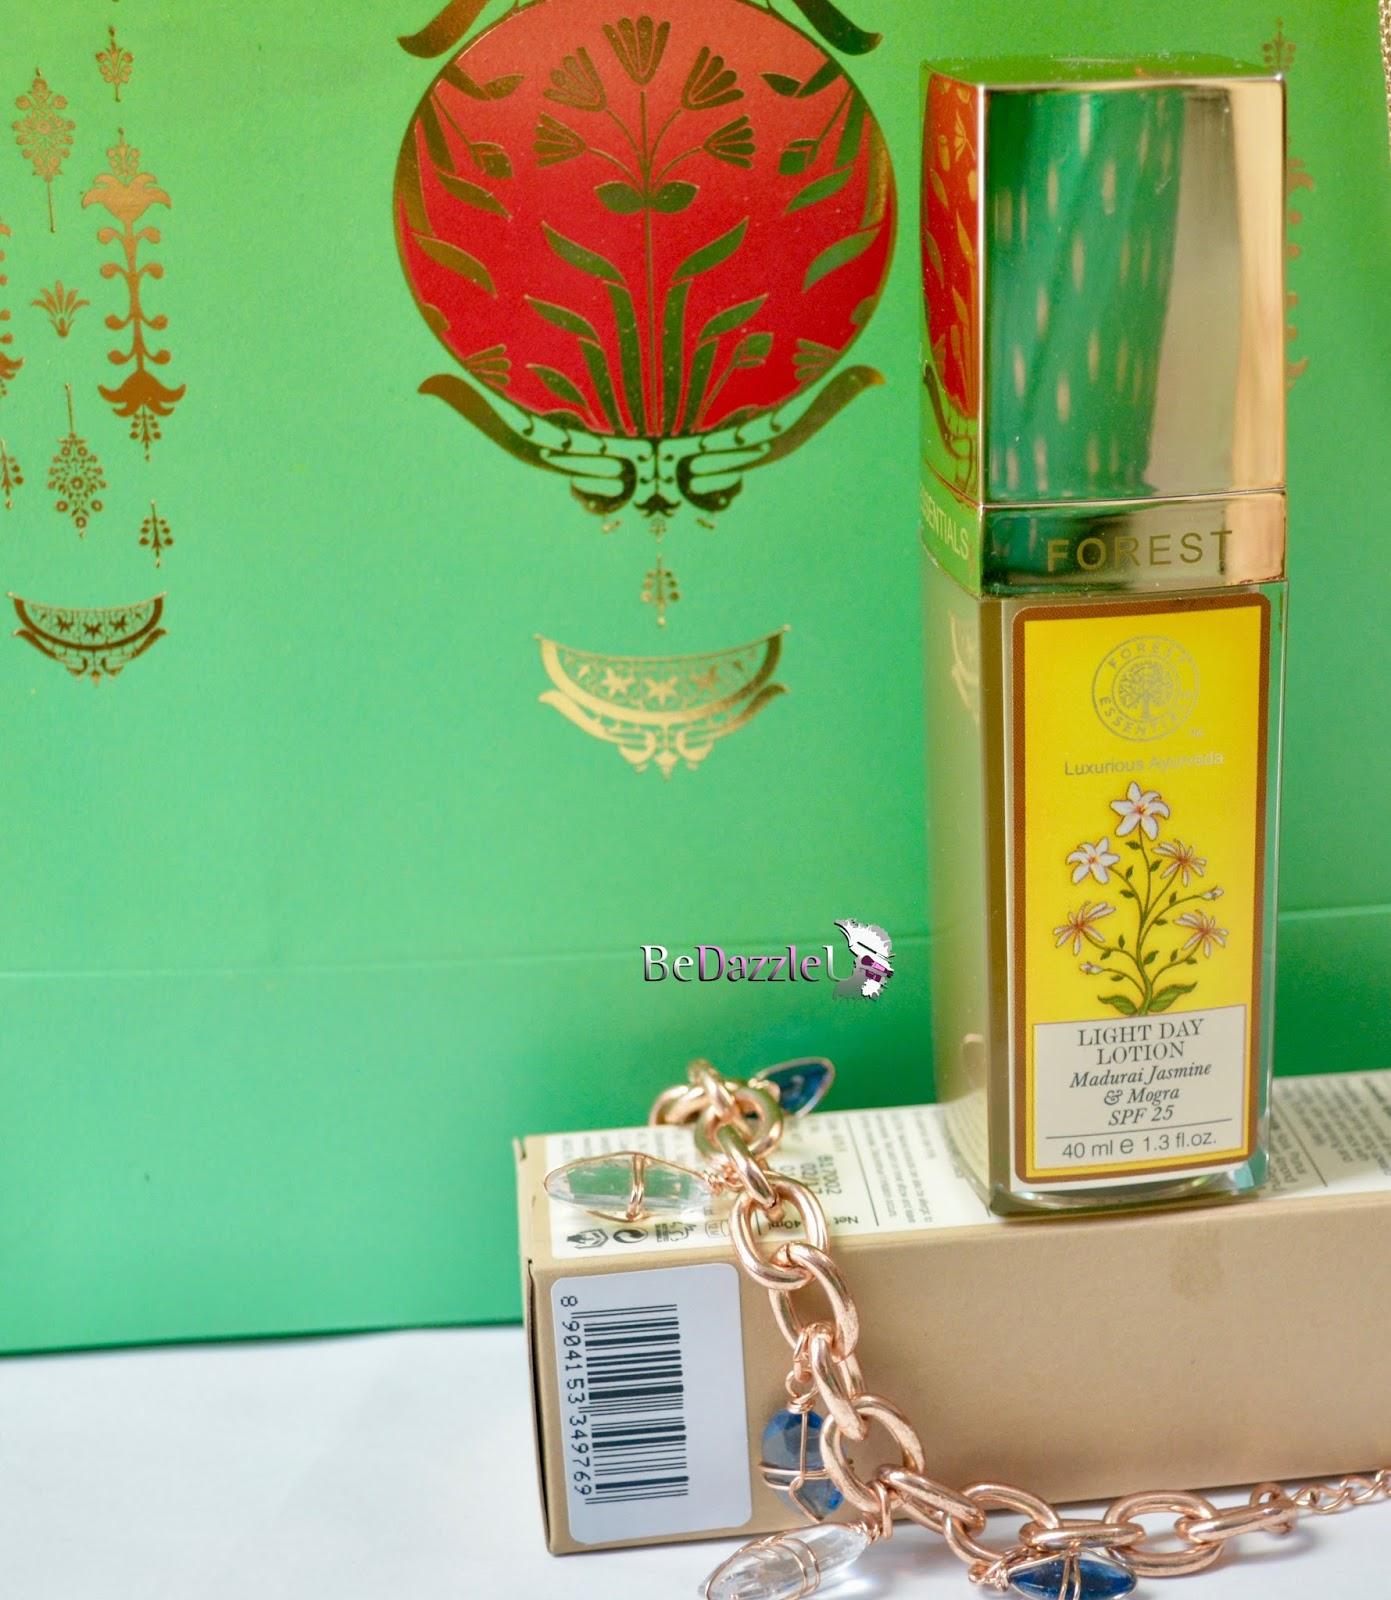 Forest essentials light day lotion madurai jasmine and mogra spf 25 for combination skin solutioingenieria Images